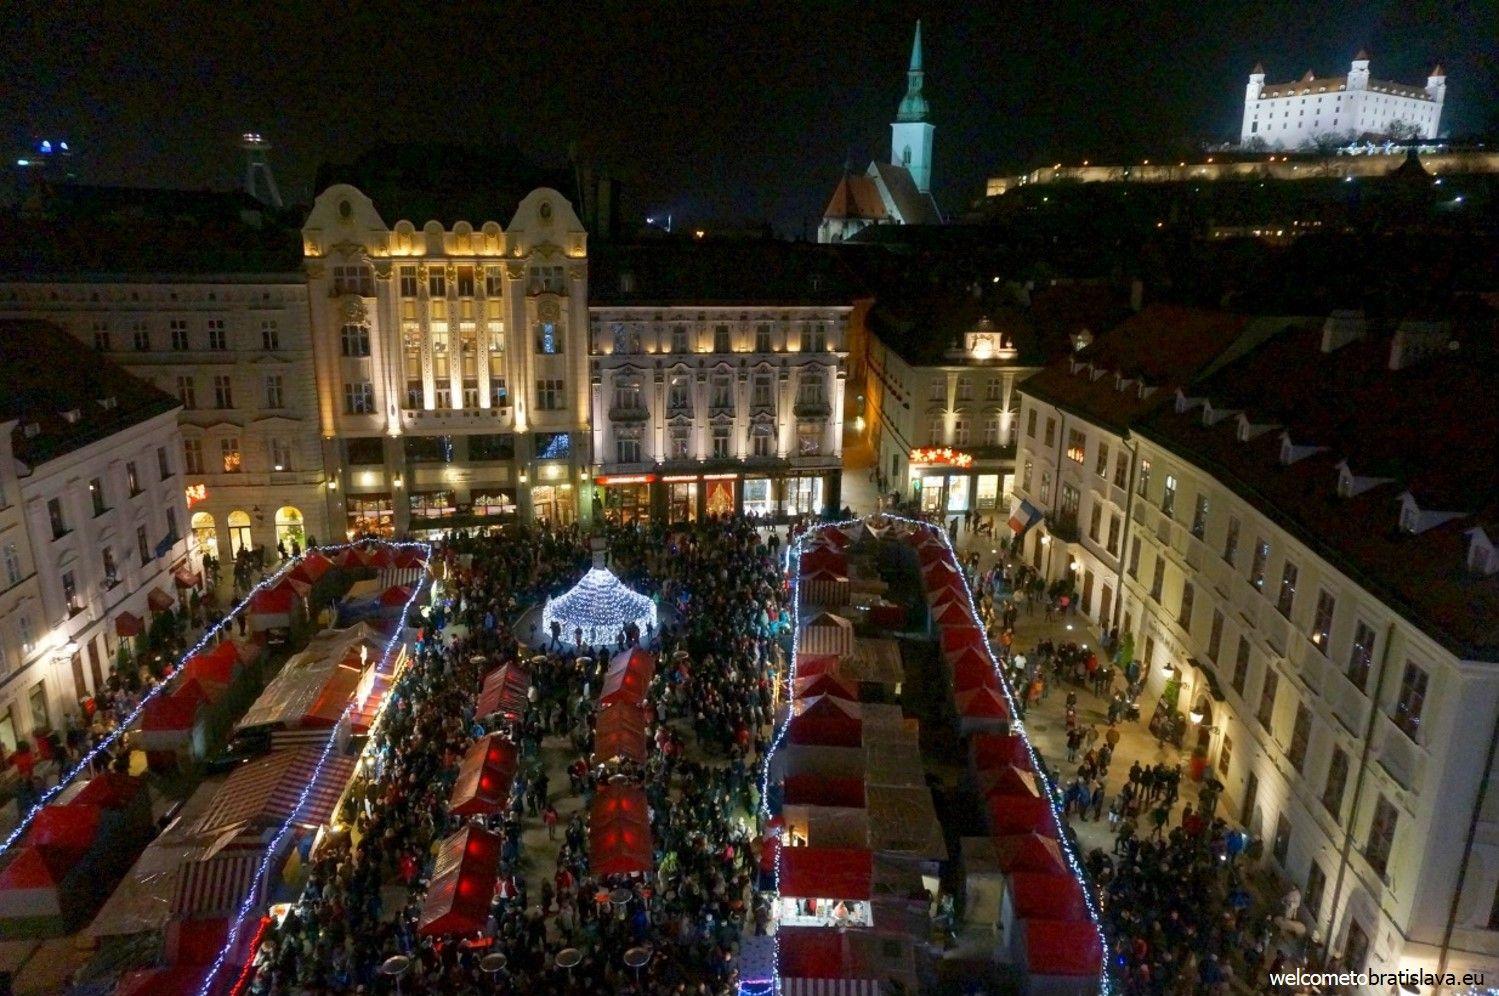 Christmas Bratislava.4 Bratislava City Break With Christmas Markets 28th Nov